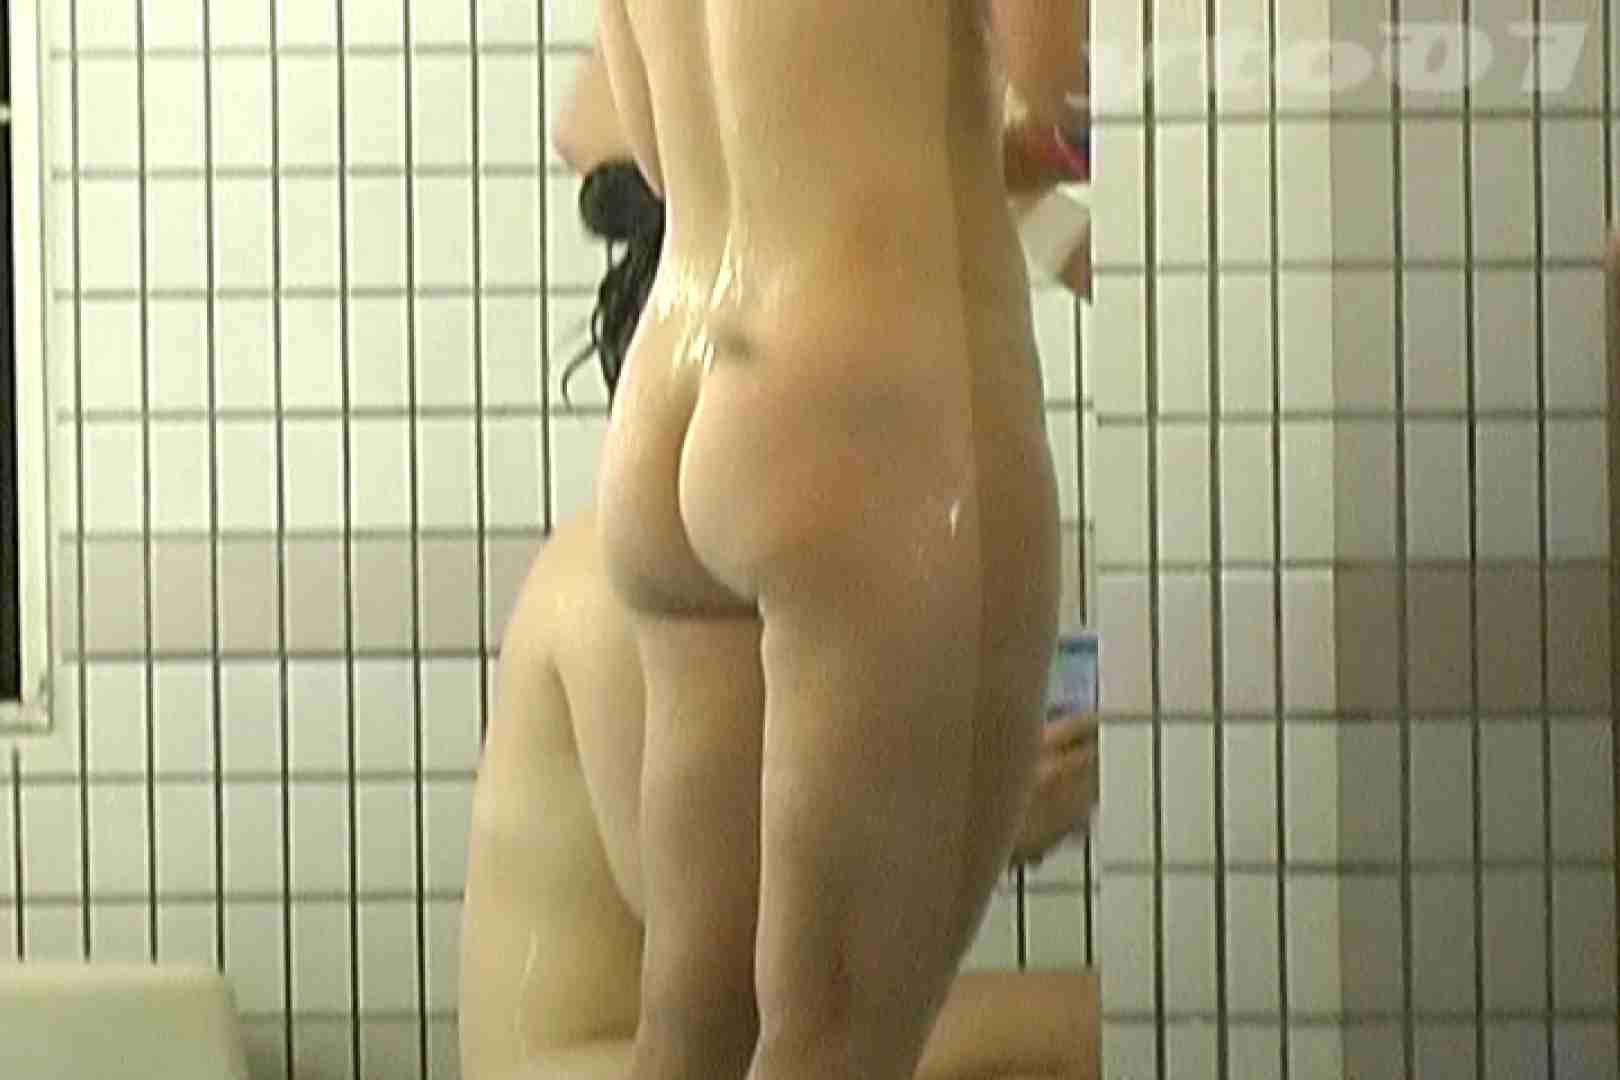 ▲復活限定▲合宿ホテル女風呂盗撮 Vol.08 合宿中の出来事 AV無料 83画像 39